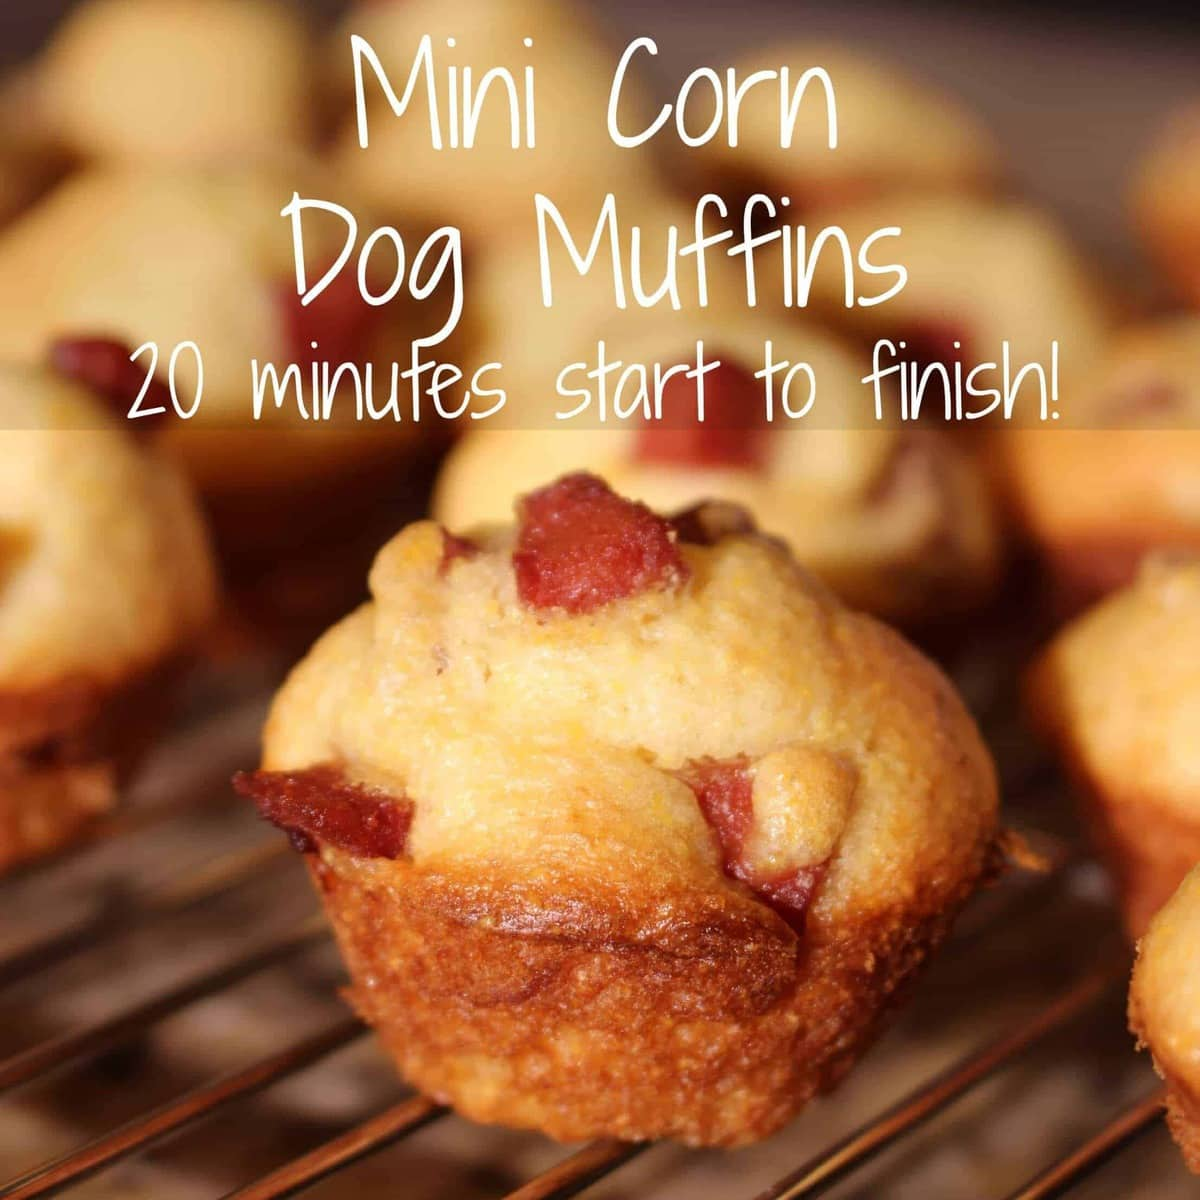 Mini corn dog muffins - 20 minute appetizer, start to finish!